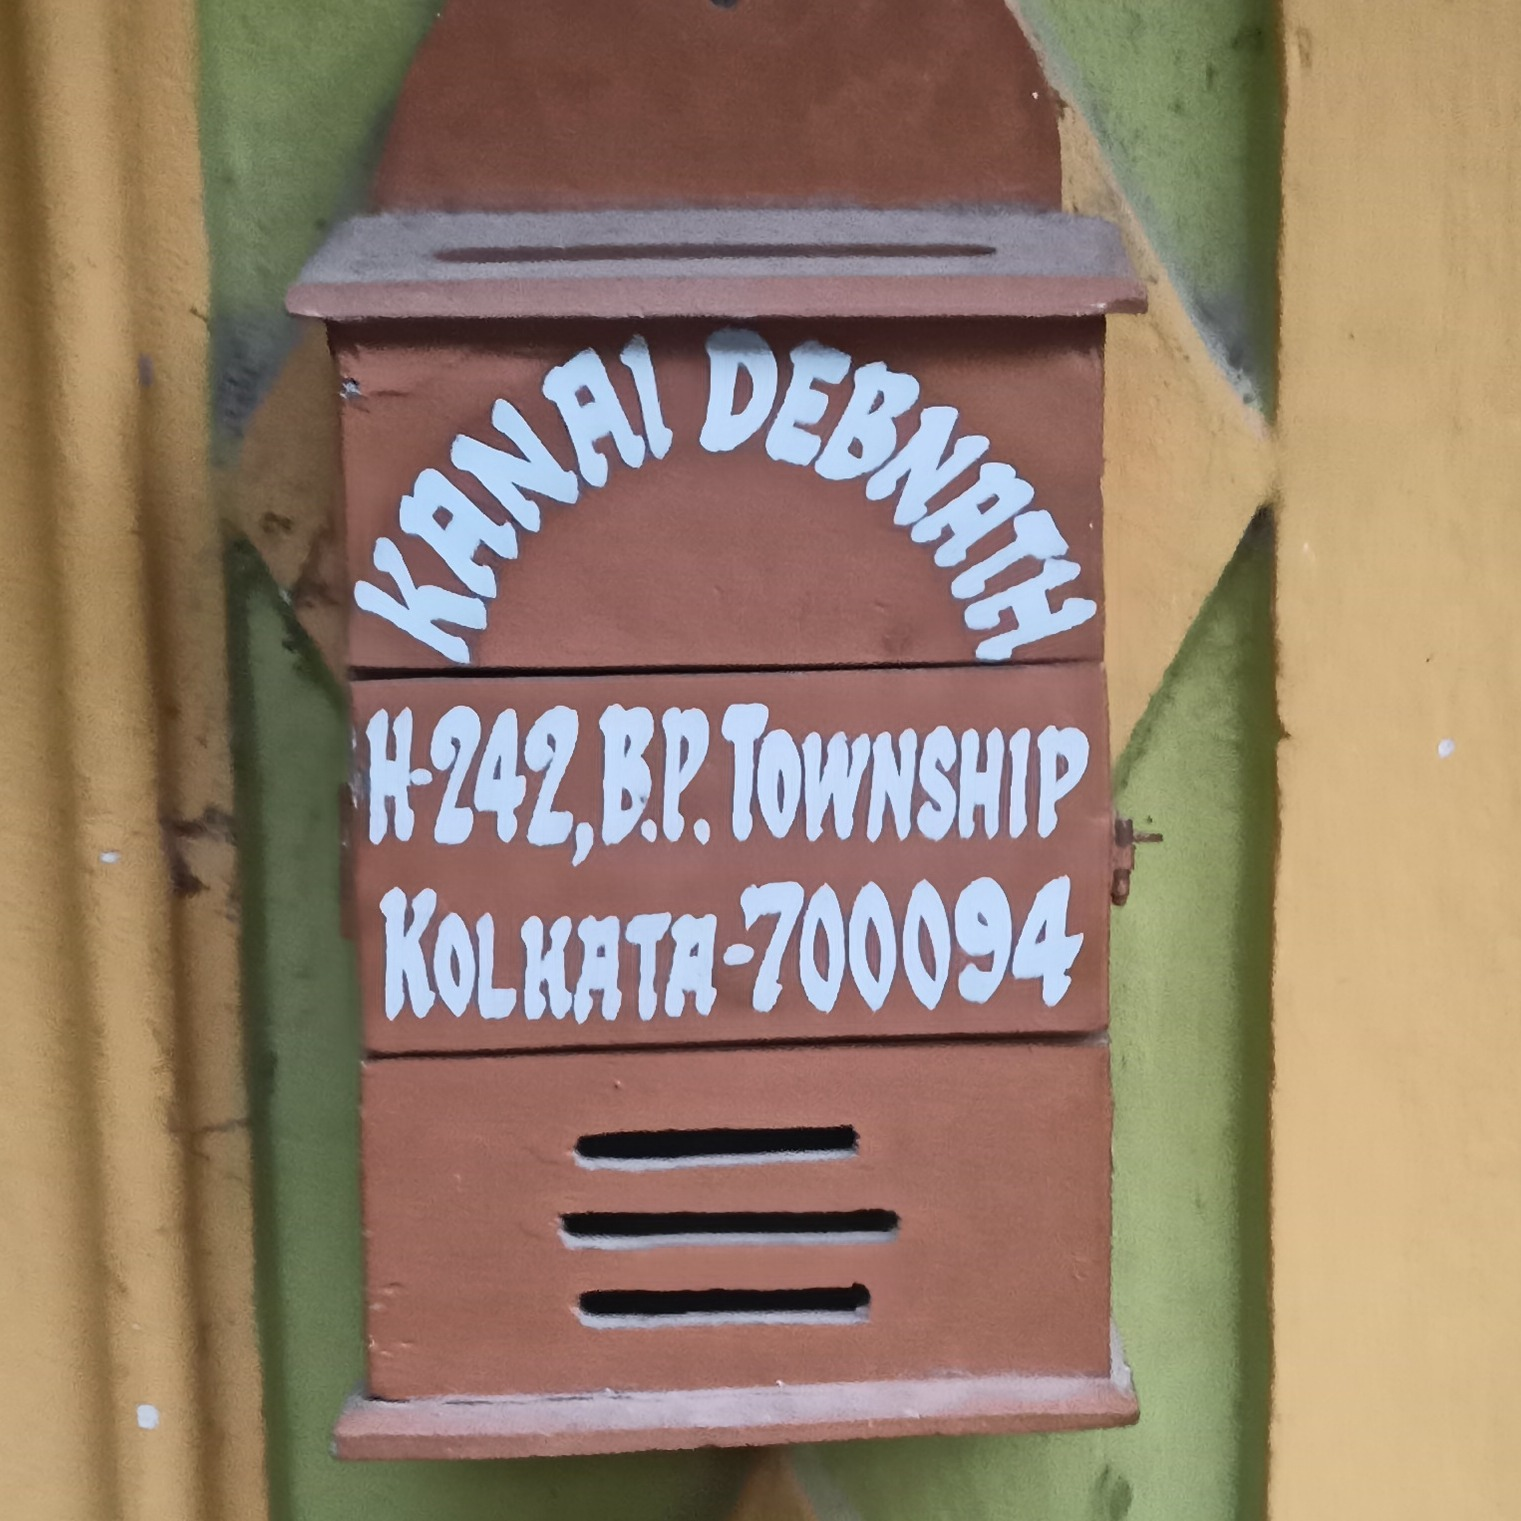 map-location-Picture-baishnabghata-patuli-township-2476728